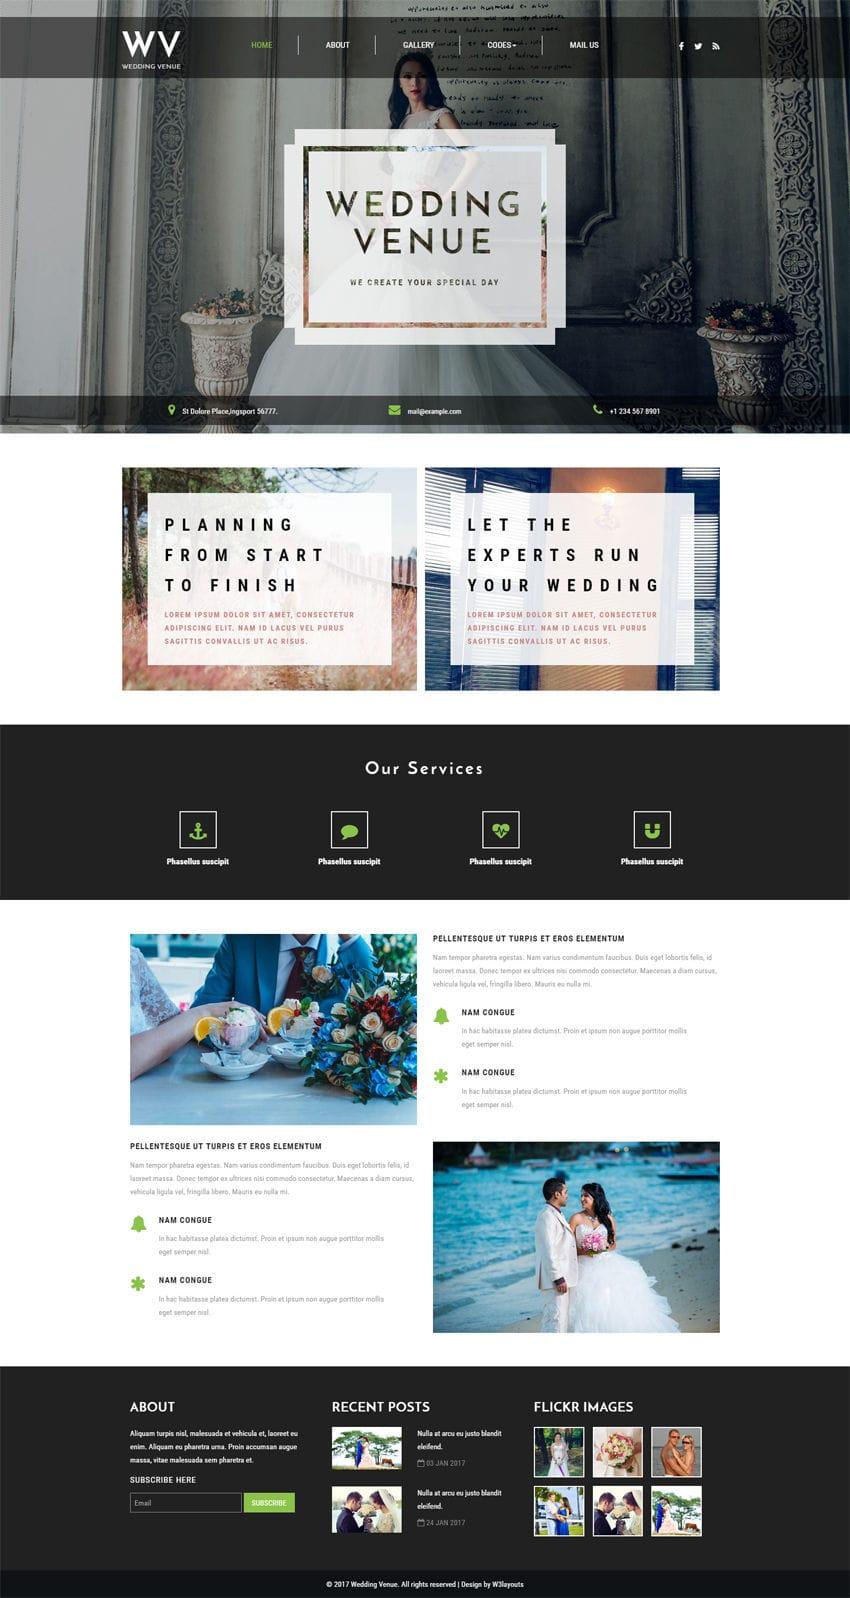 wedding venue a wedding category bootstrap responsive web template. Black Bedroom Furniture Sets. Home Design Ideas